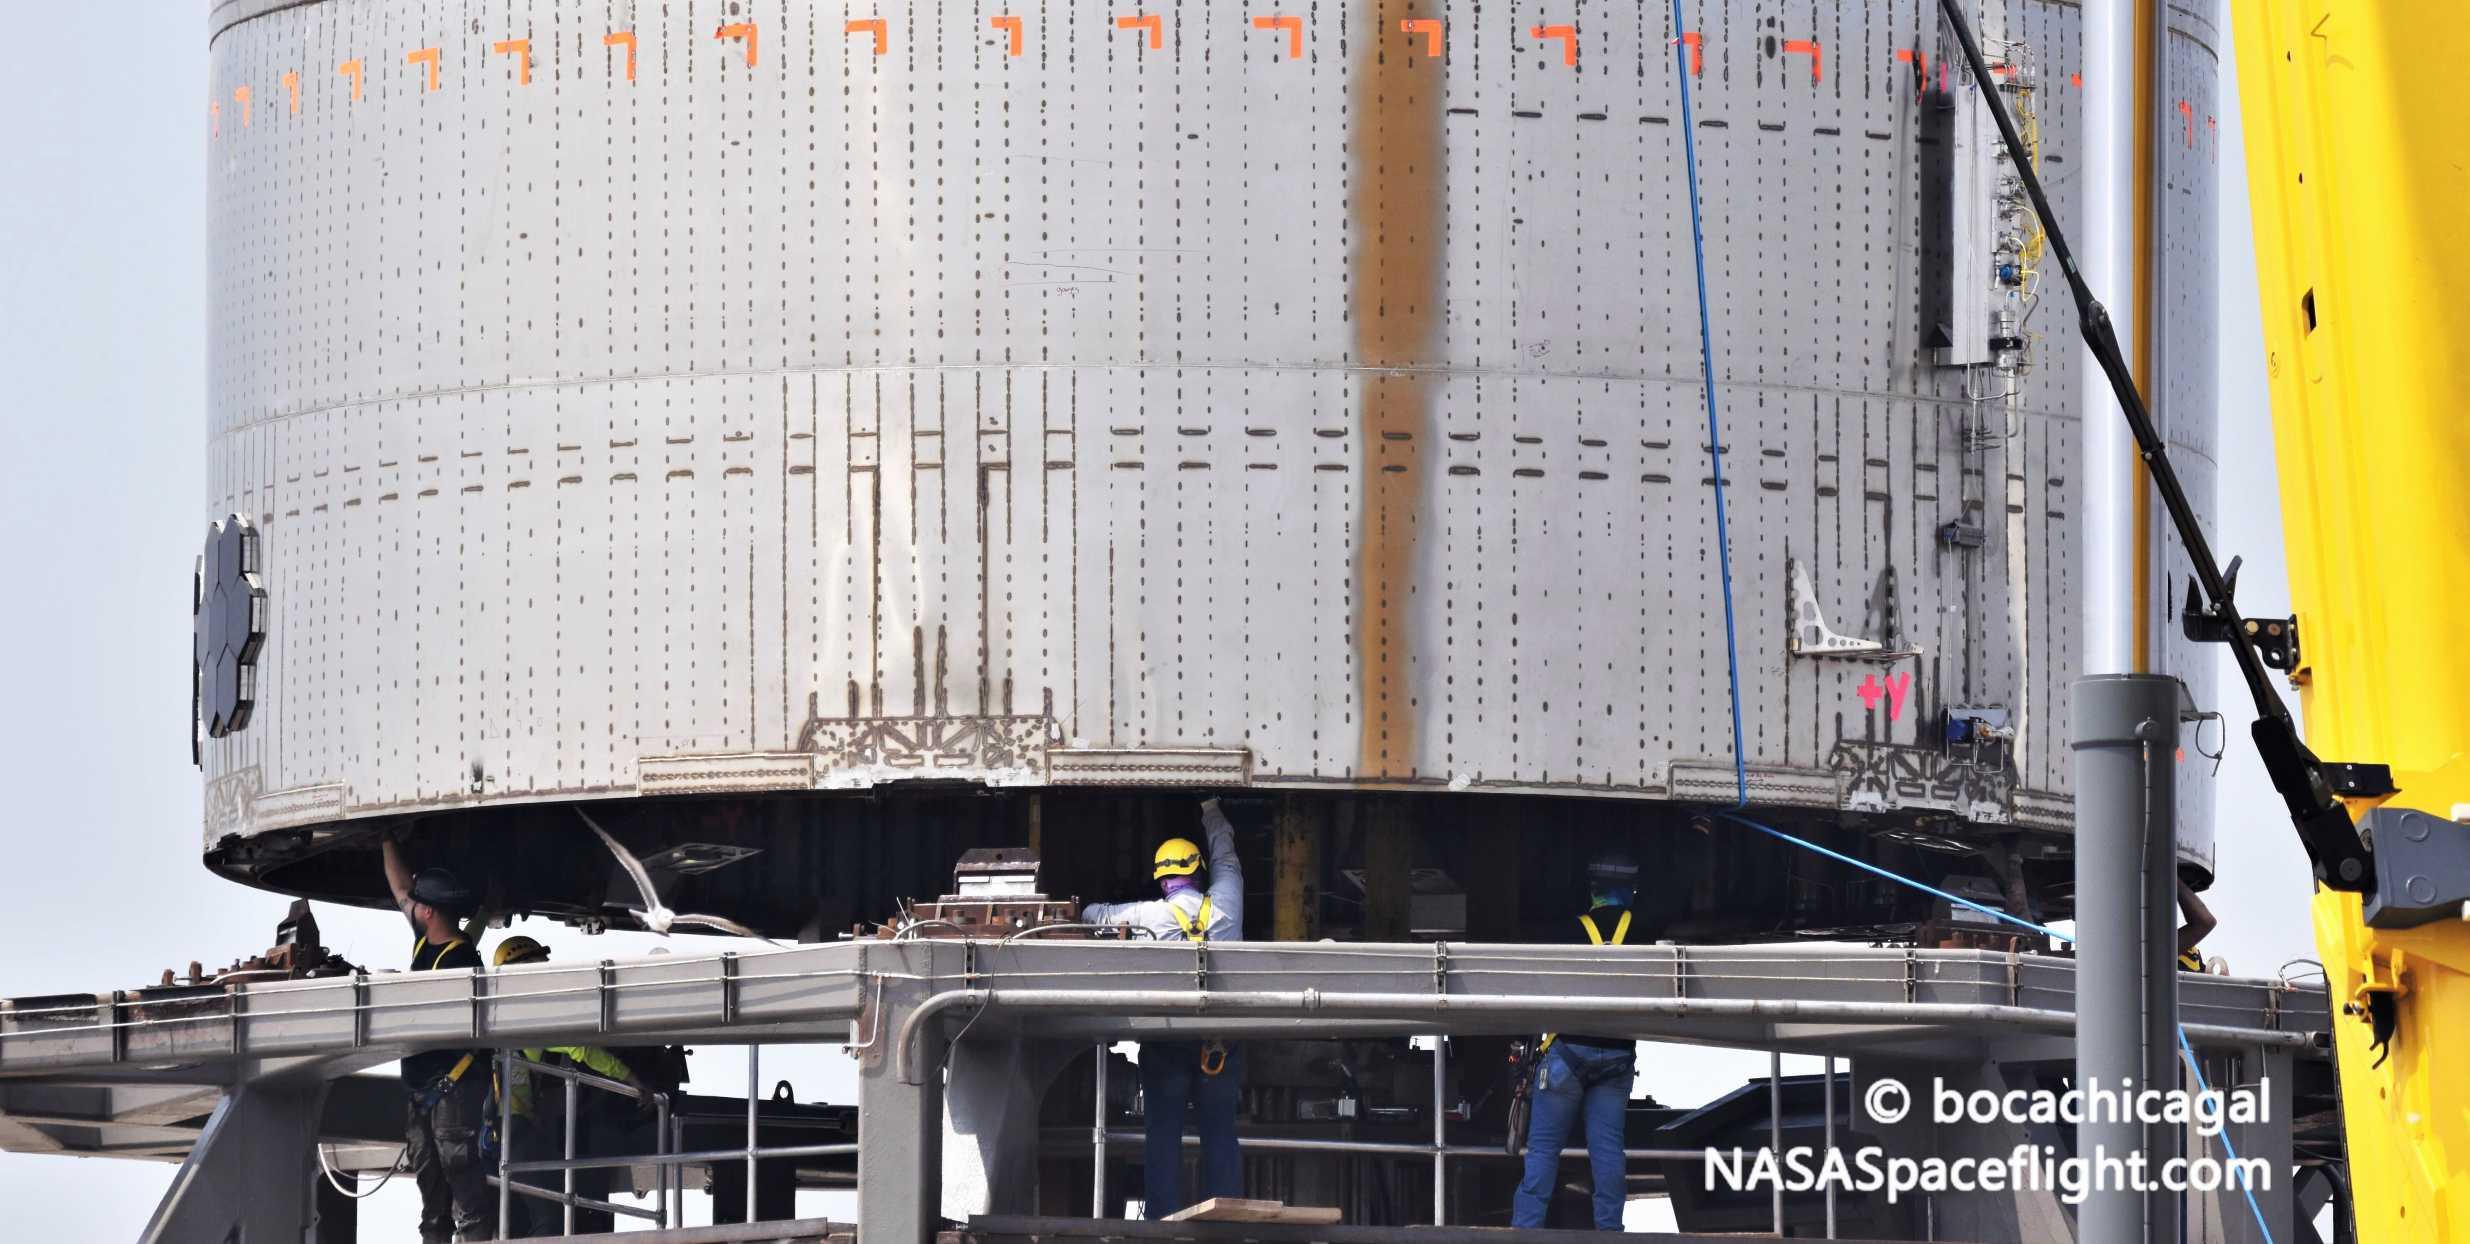 Starship Boca Chica 042320 (NASASpaceflight – bocachicagal) SN4 pad move 14 crop (c)